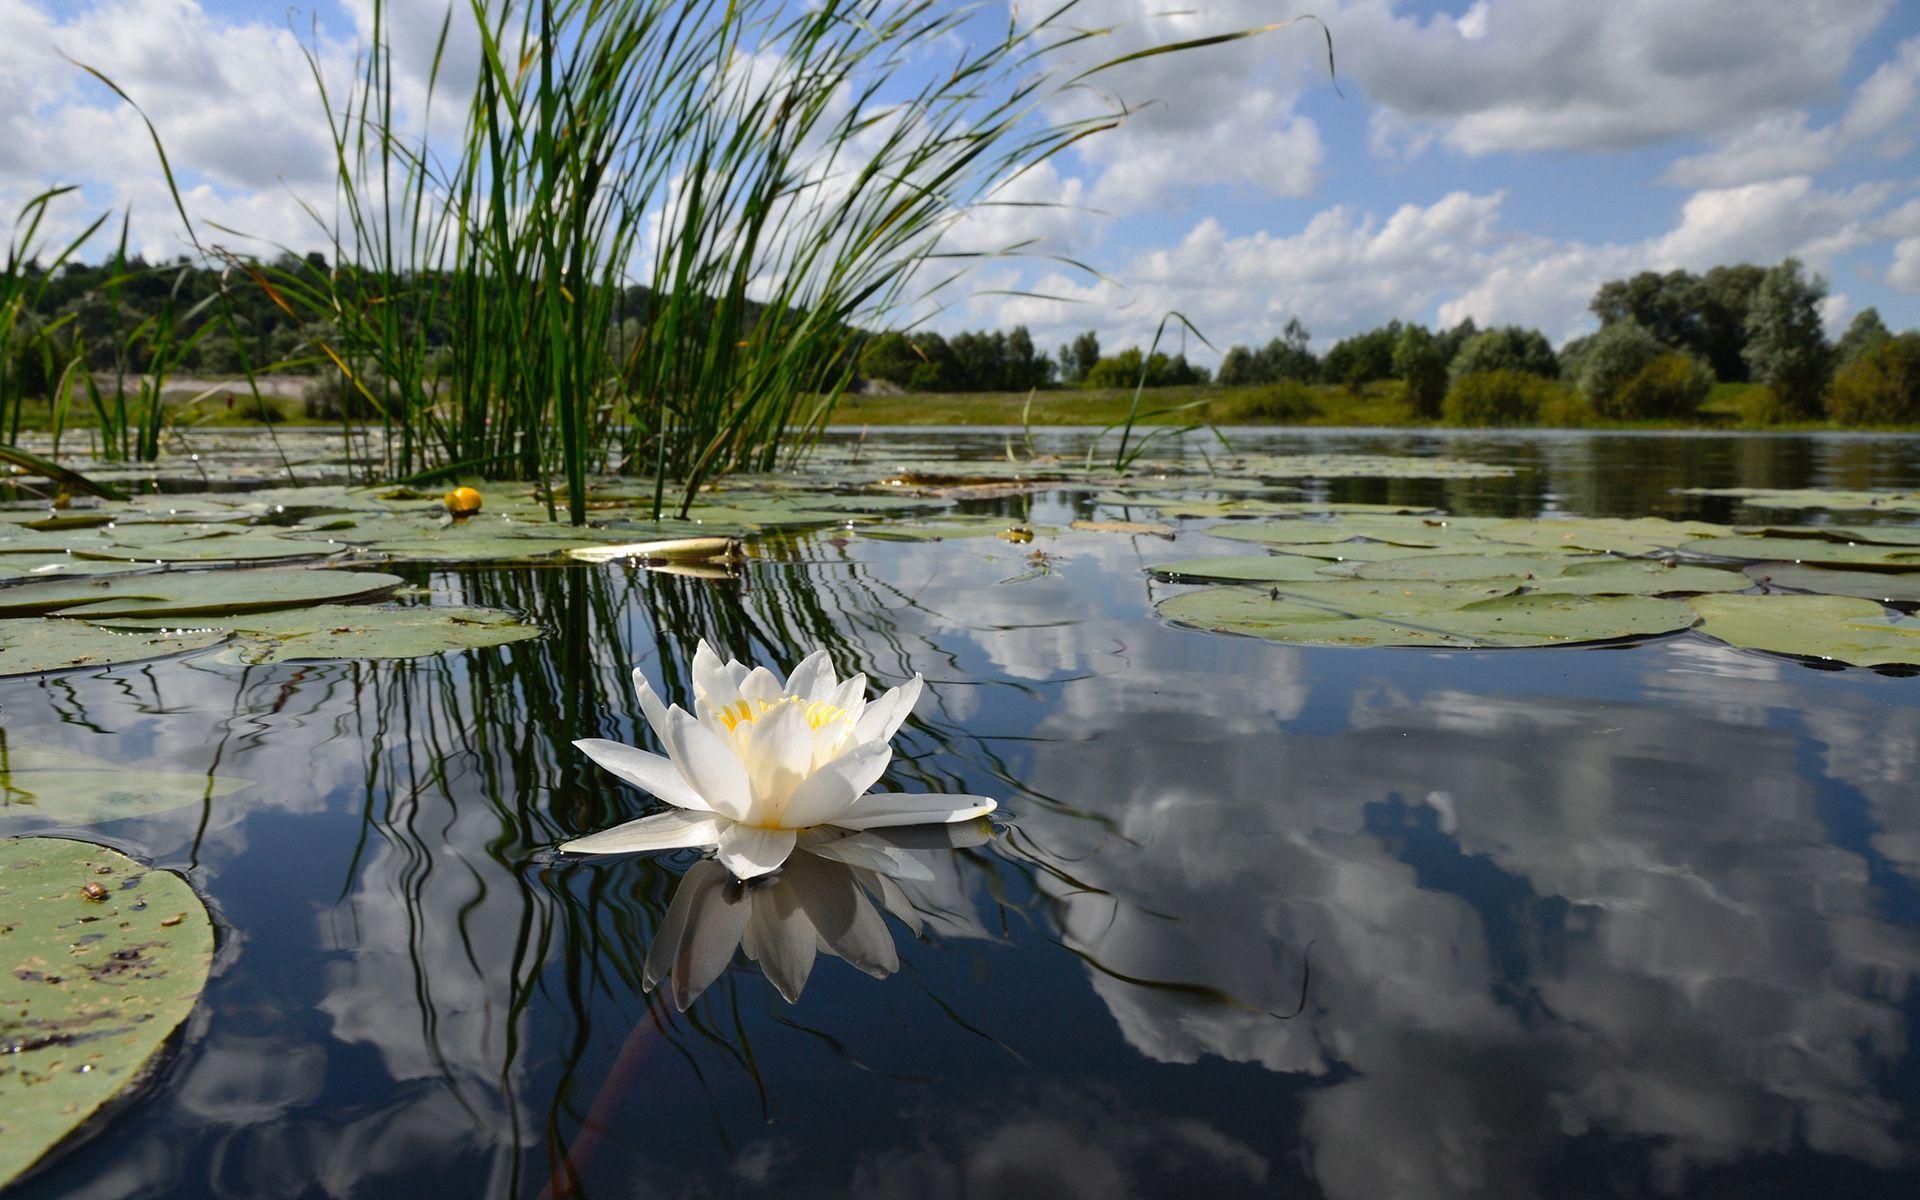 69776 скачать обои Природа, Цветок, Облака, Кувшинка, Озеро, Отражение, Лилия, Зеркало - заставки и картинки бесплатно